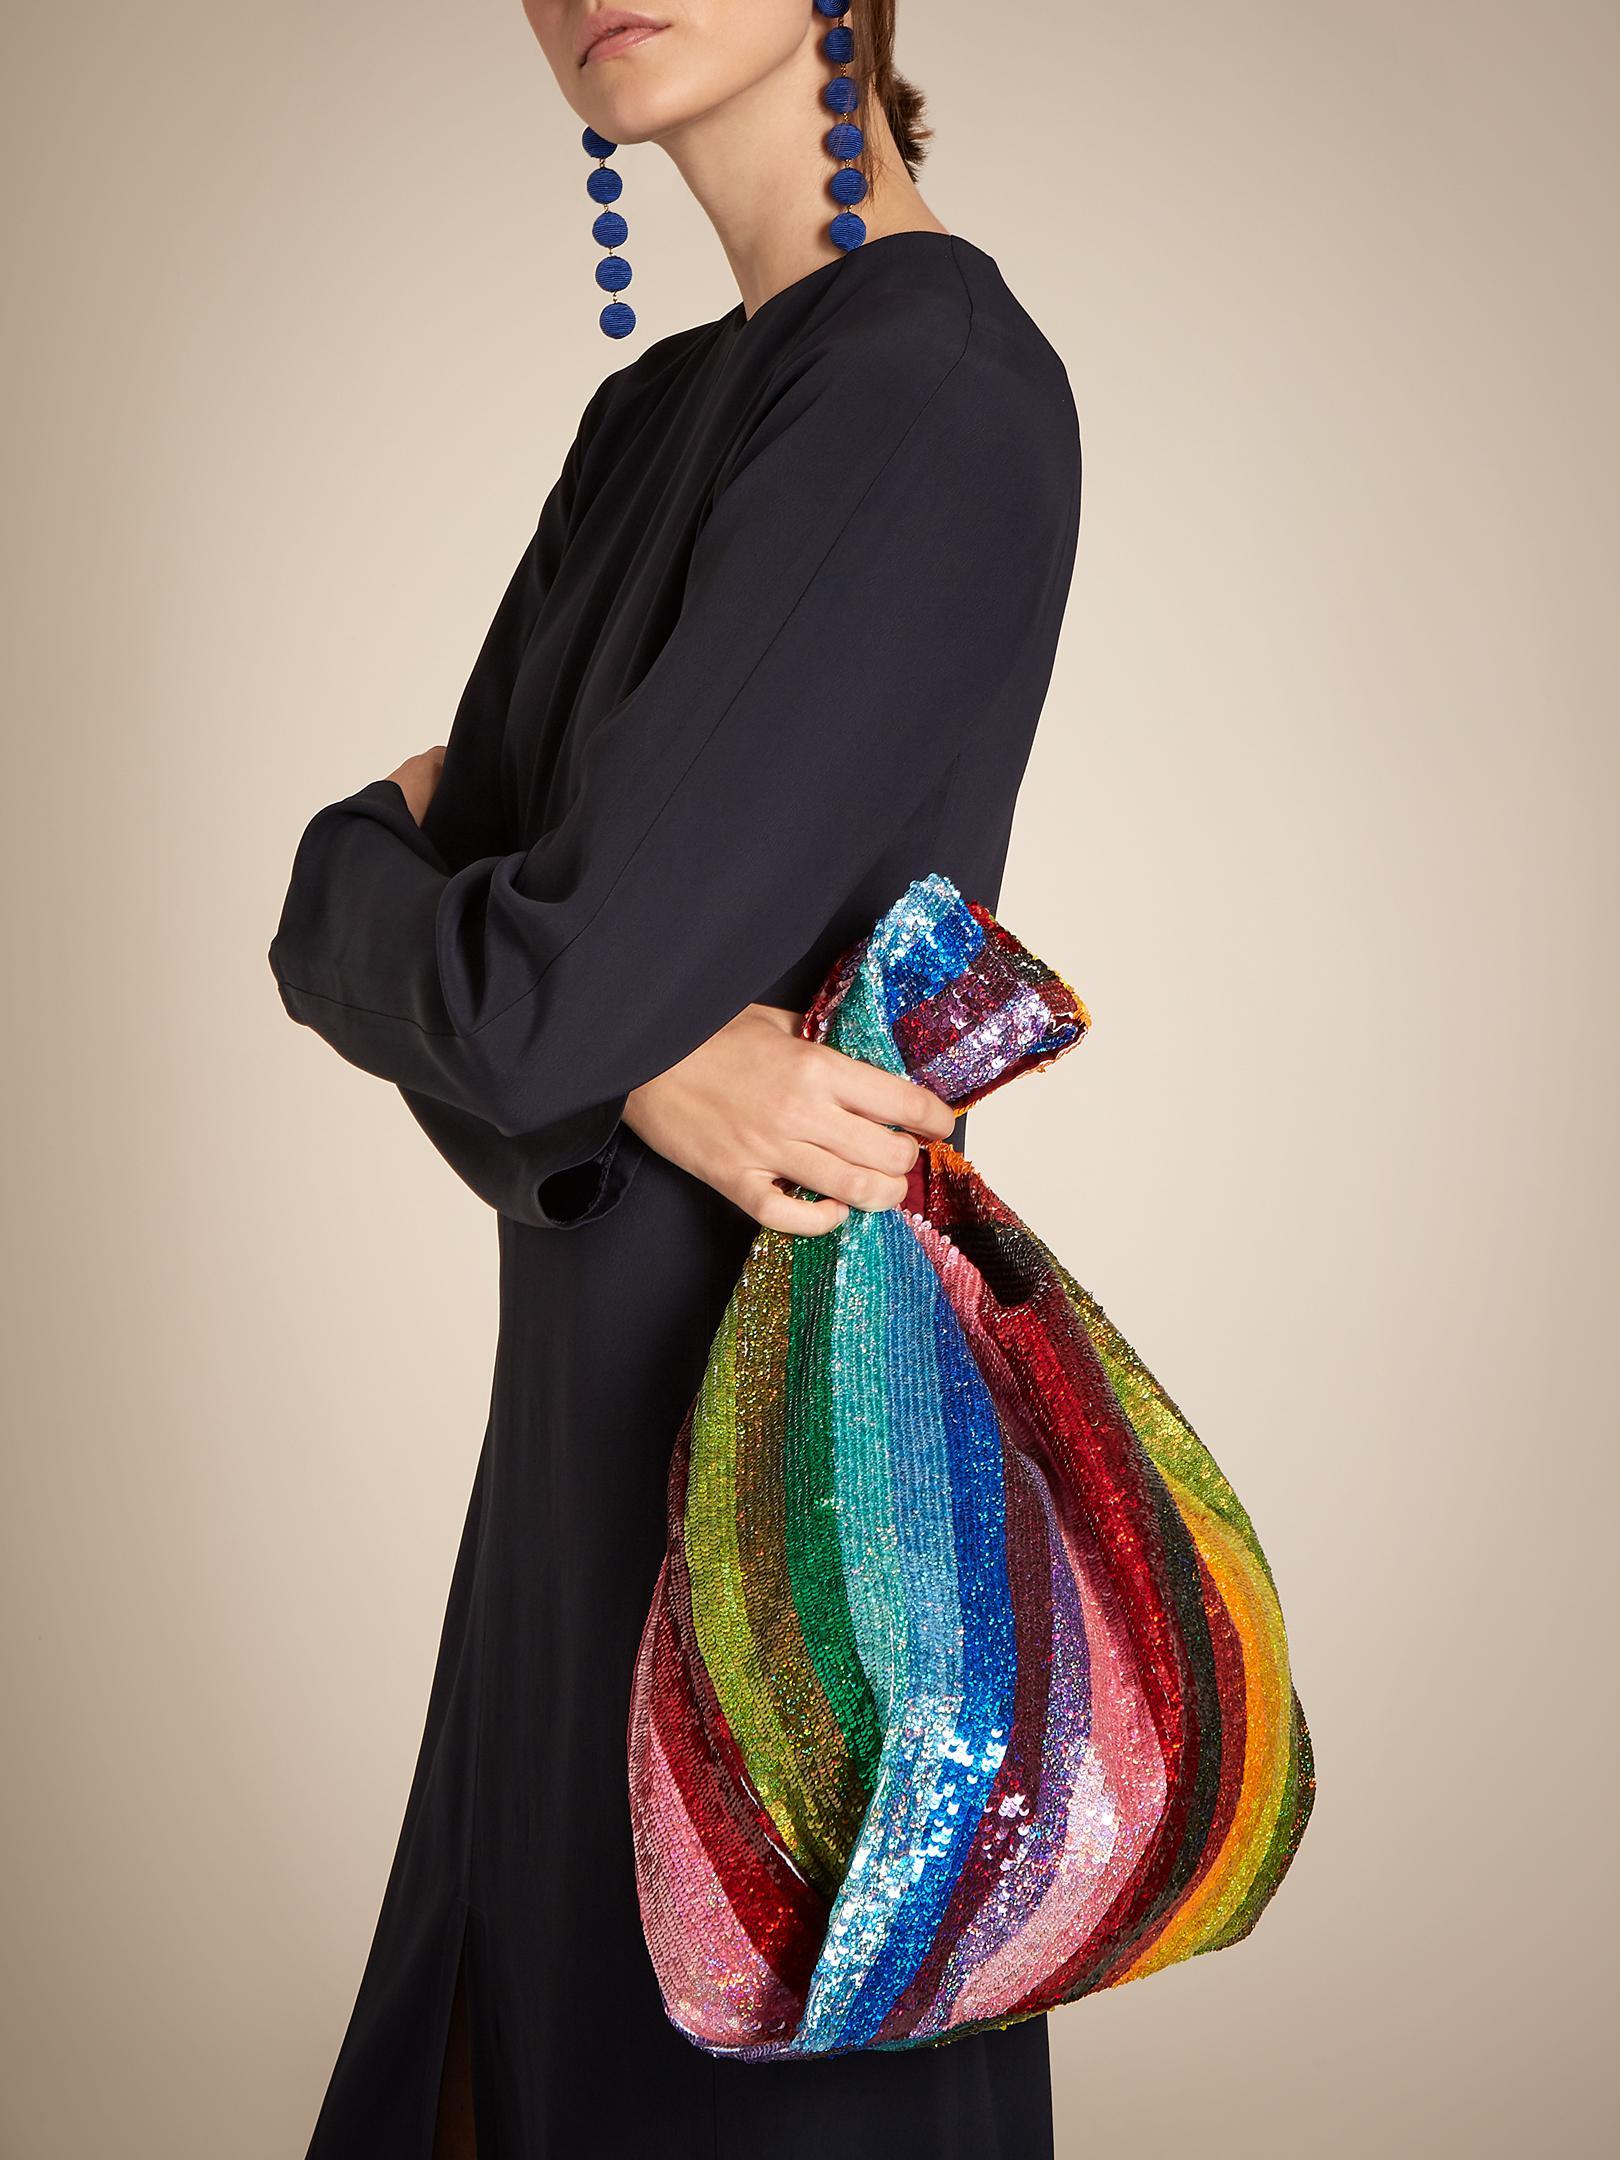 aeab63ff Ashish Striped Sequin-embellished Bag - Lyst